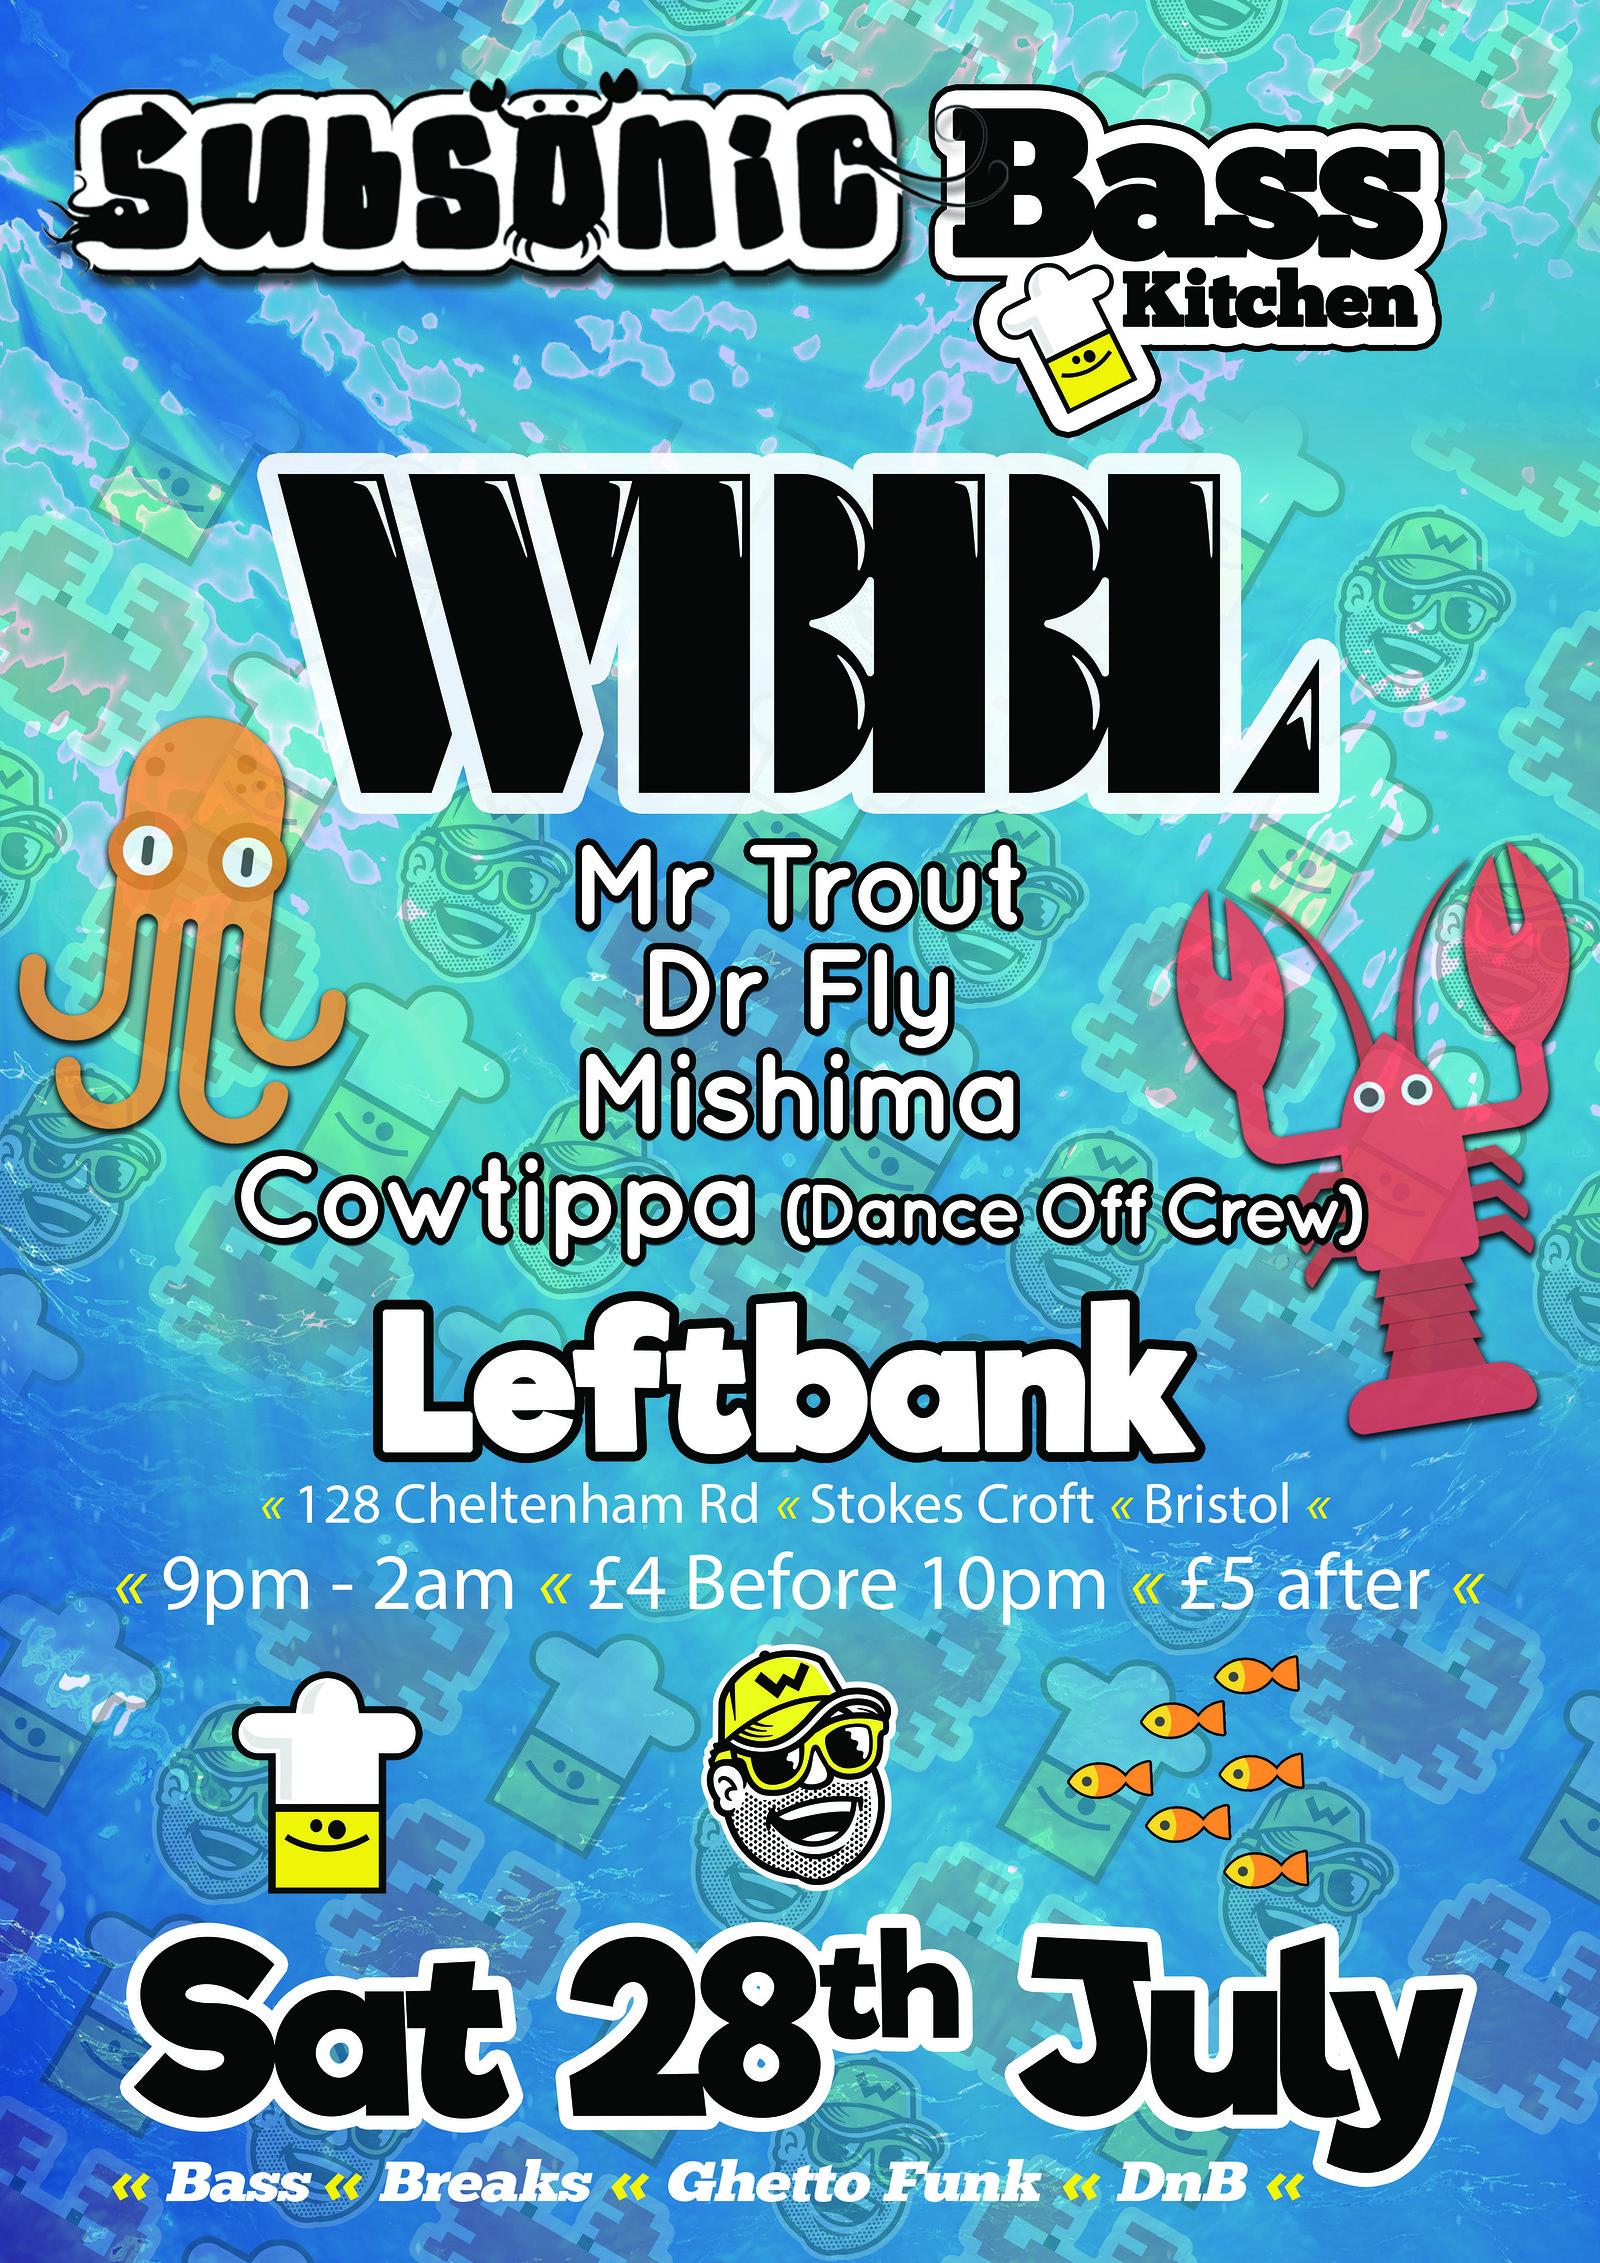 Subsonic Bass Pt  1 with WBBL!, LEFTBANK – Headfirst Bristol